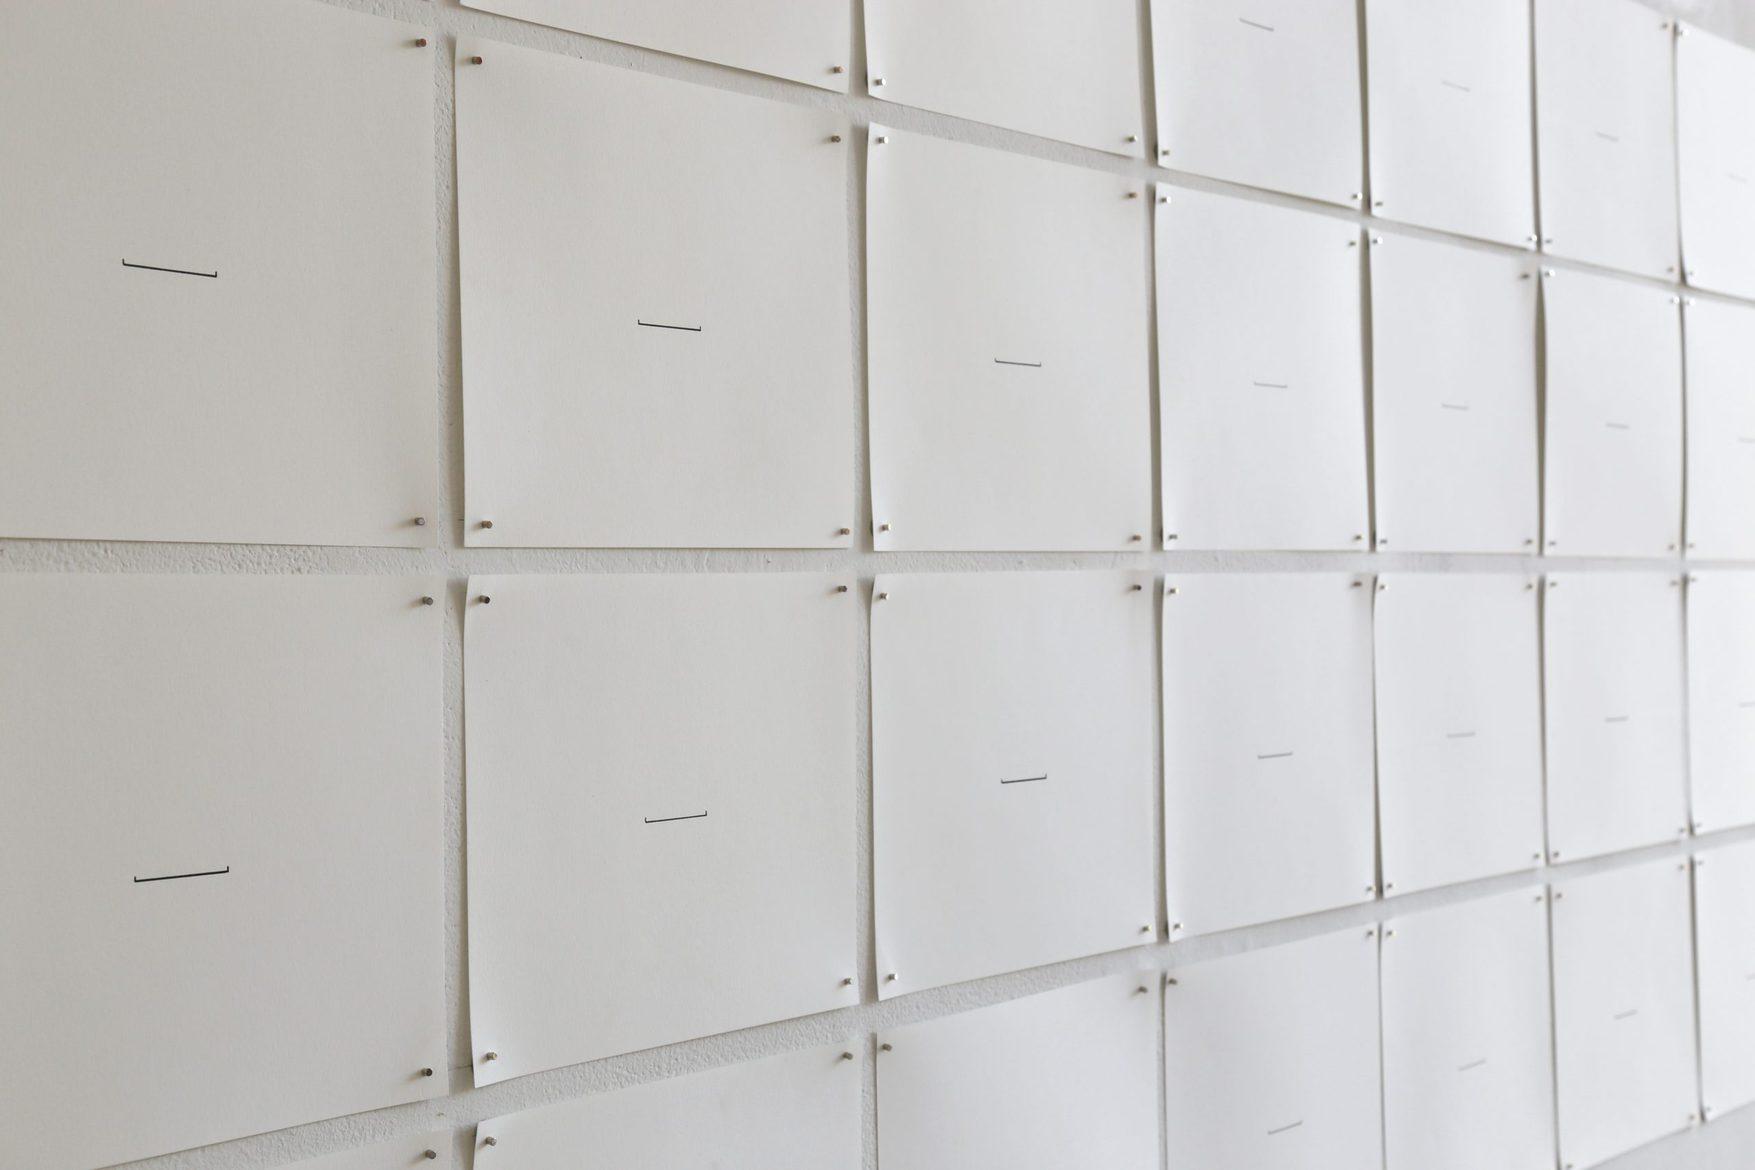 Sara Morawetz, 'Departure', 2015 – ongoing, lifelong performance and artefact (archival pen on paper), 24 x 21 cm